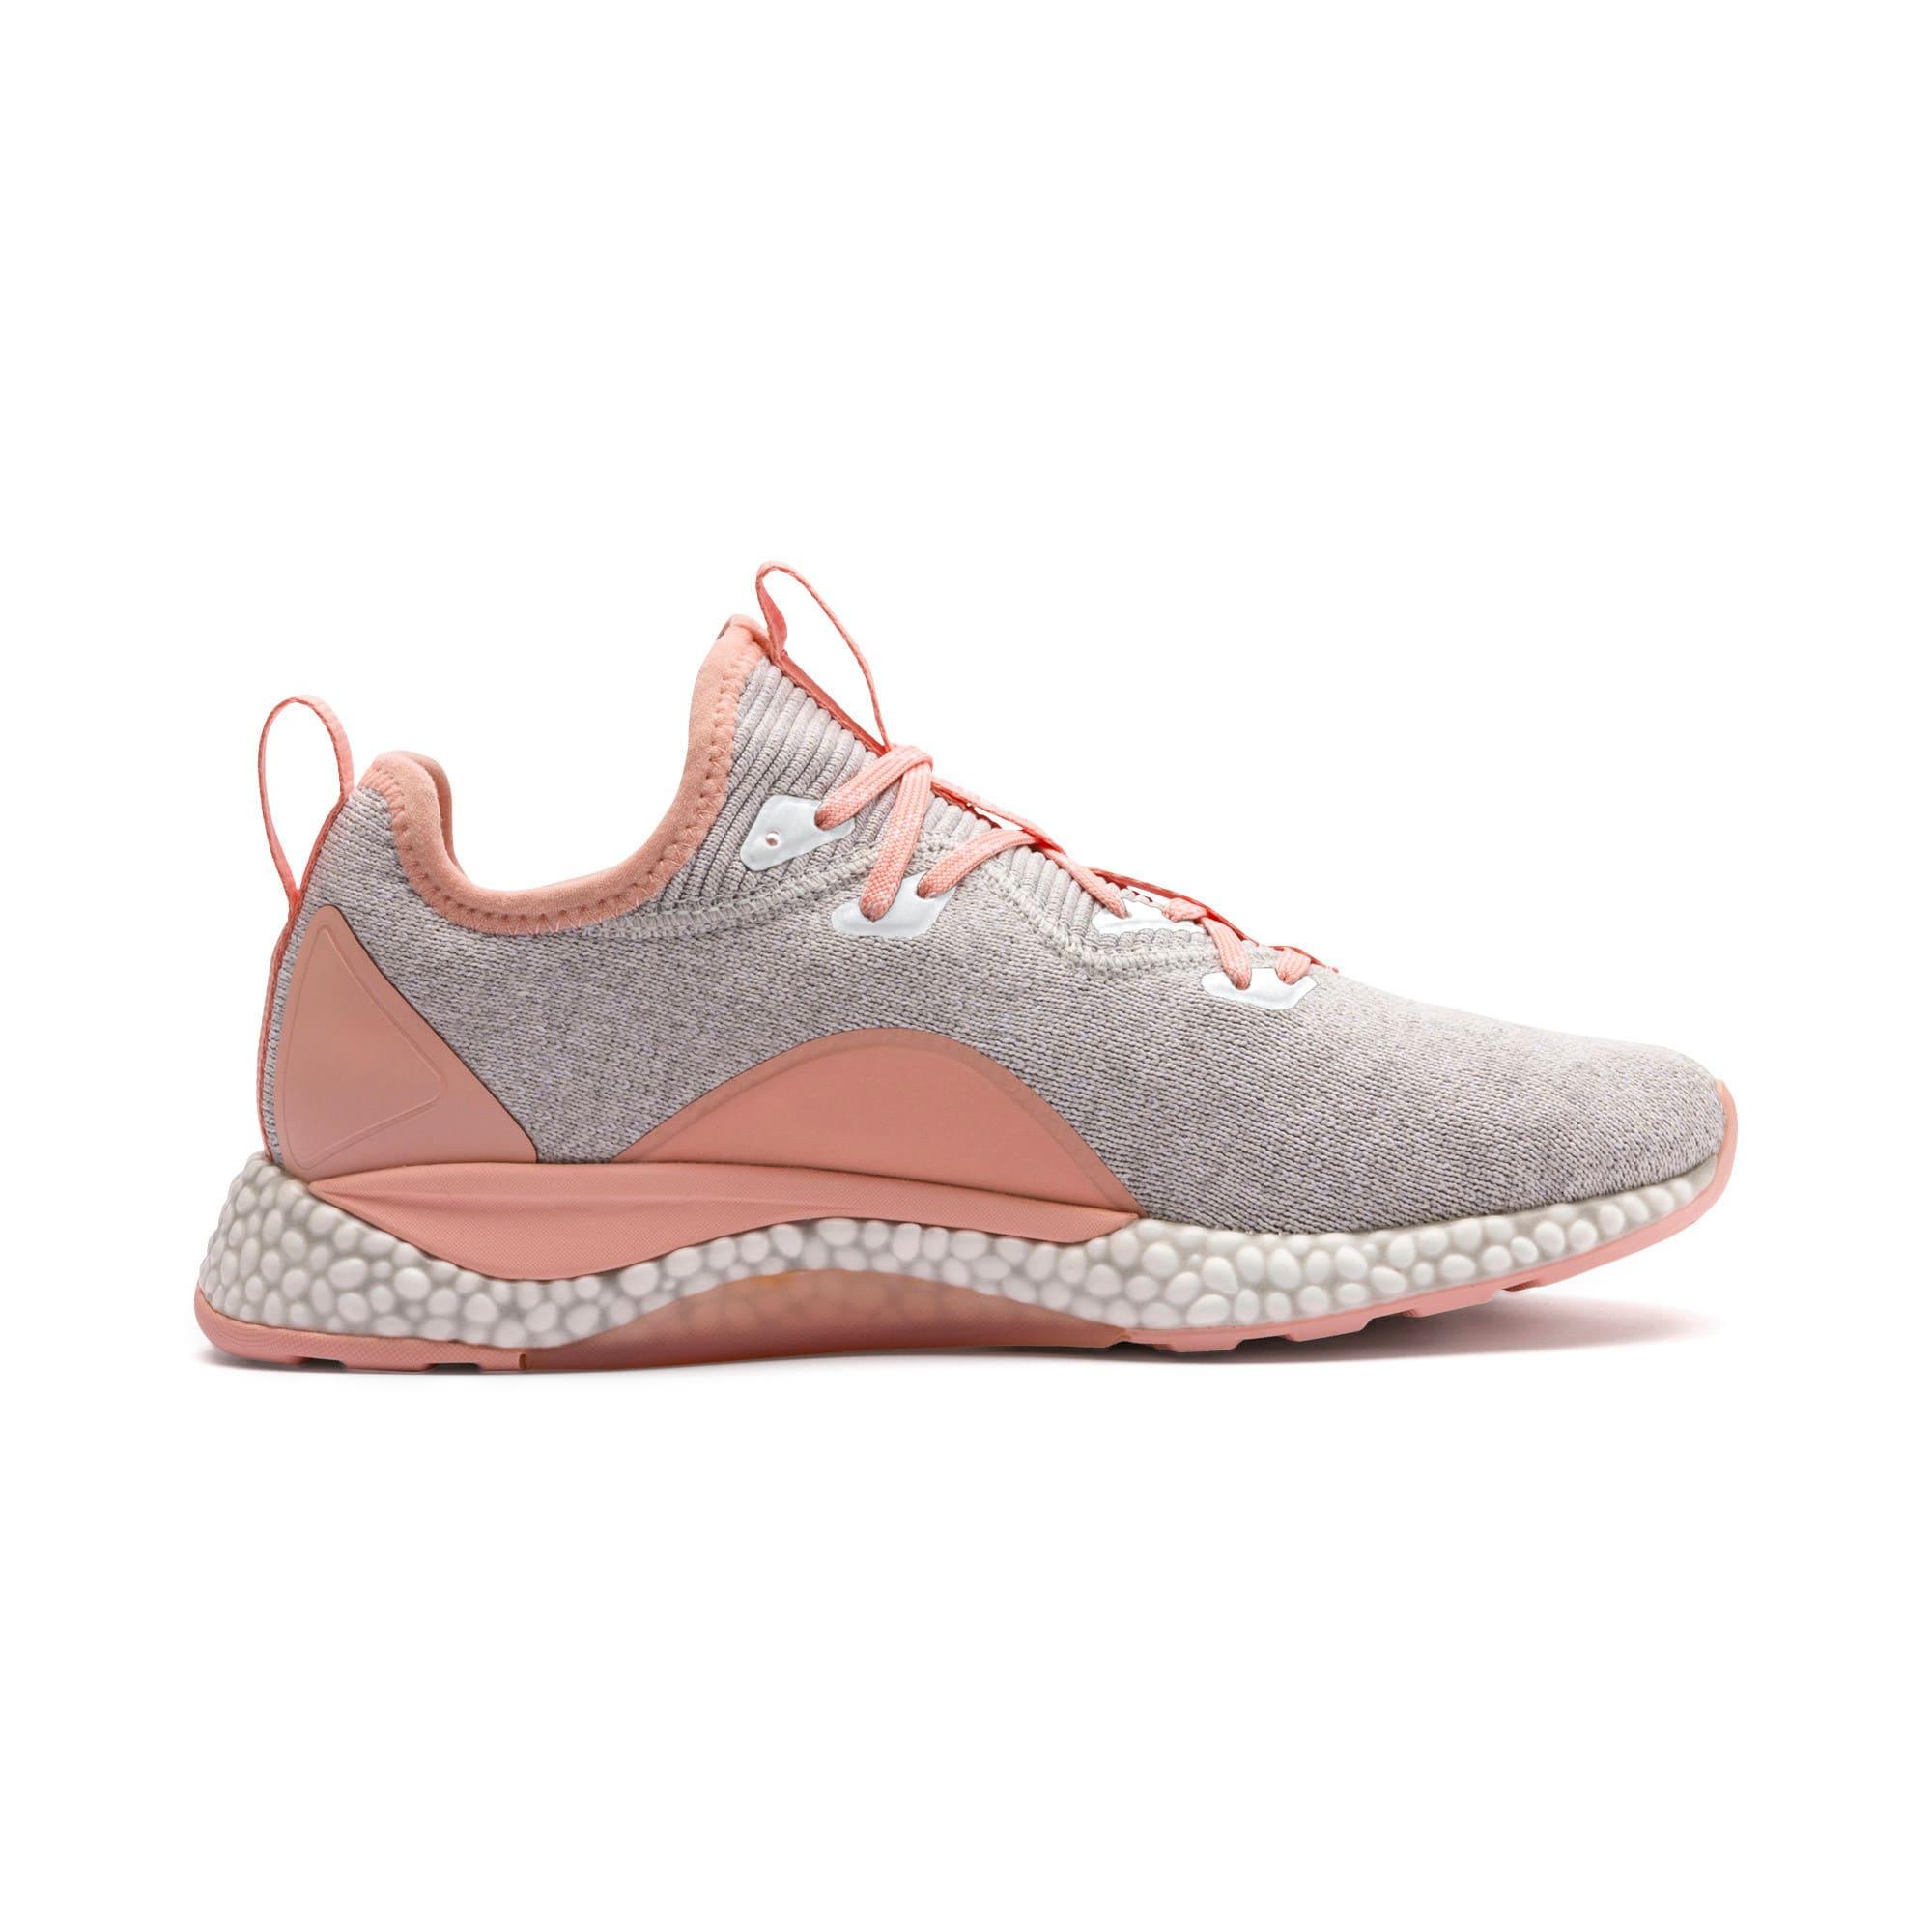 Thumbnail 6 of HYBRID Runner Women's Running Shoes, Glacier Gray-Peach Bud, medium